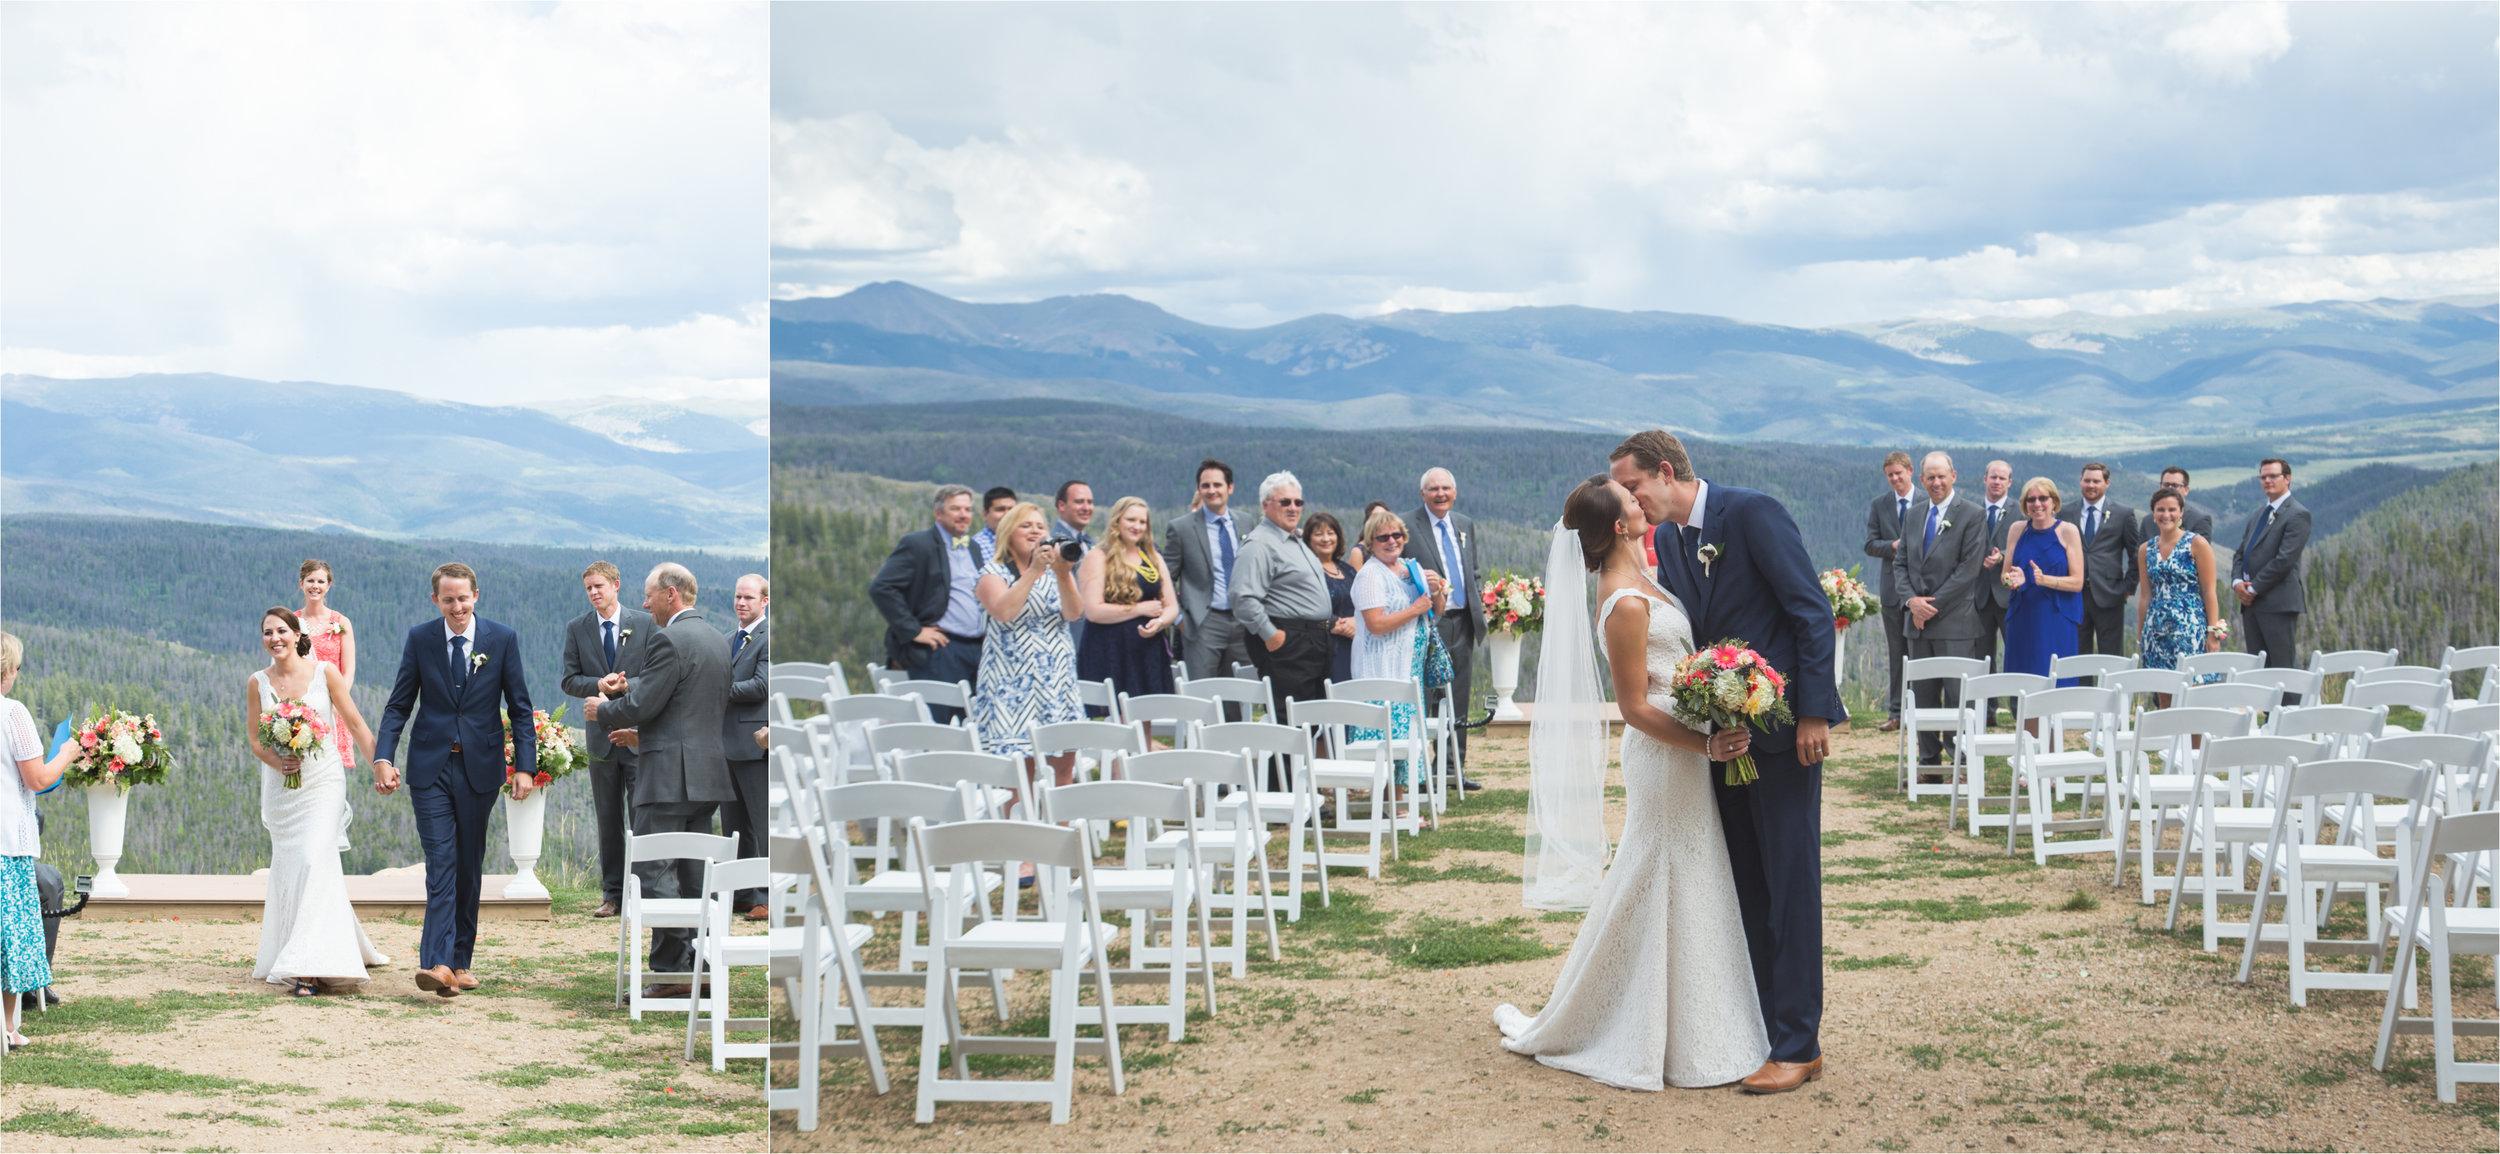 Duncan Wedding 11.jpg